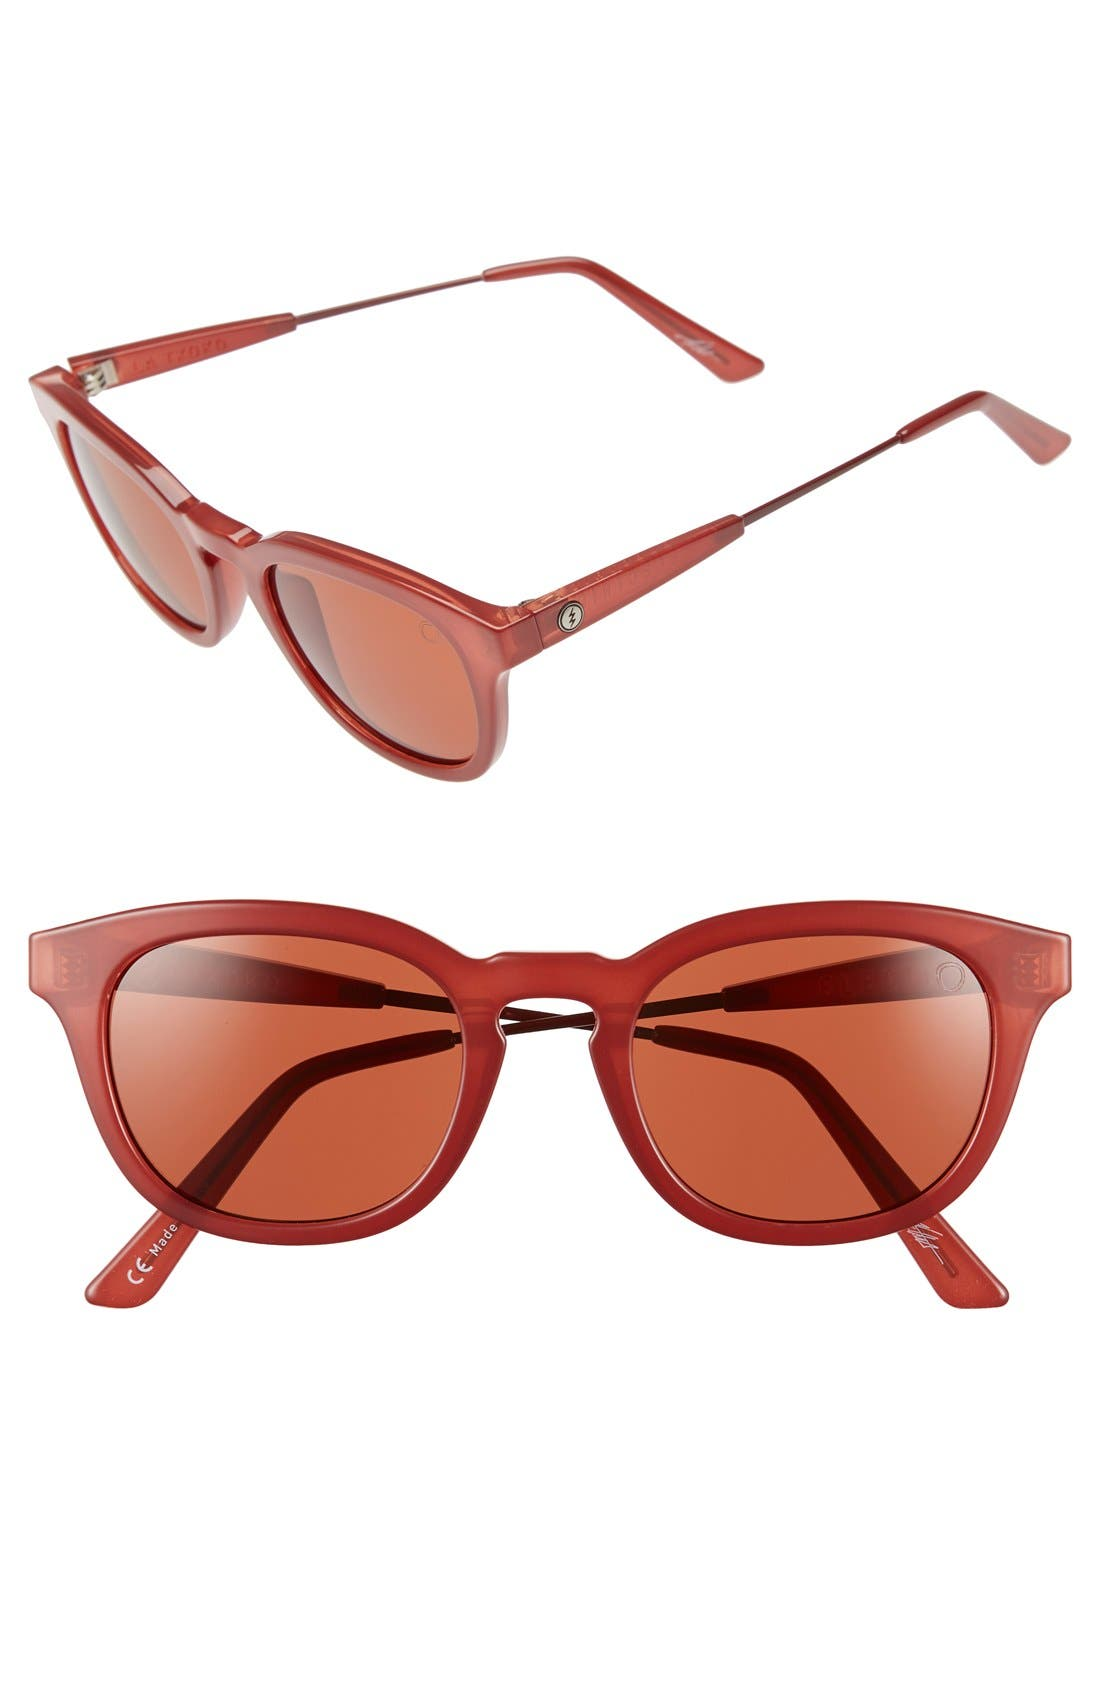 Main Image - ELECTRIC 'La Txoko' 51mm Retro Sunglasses